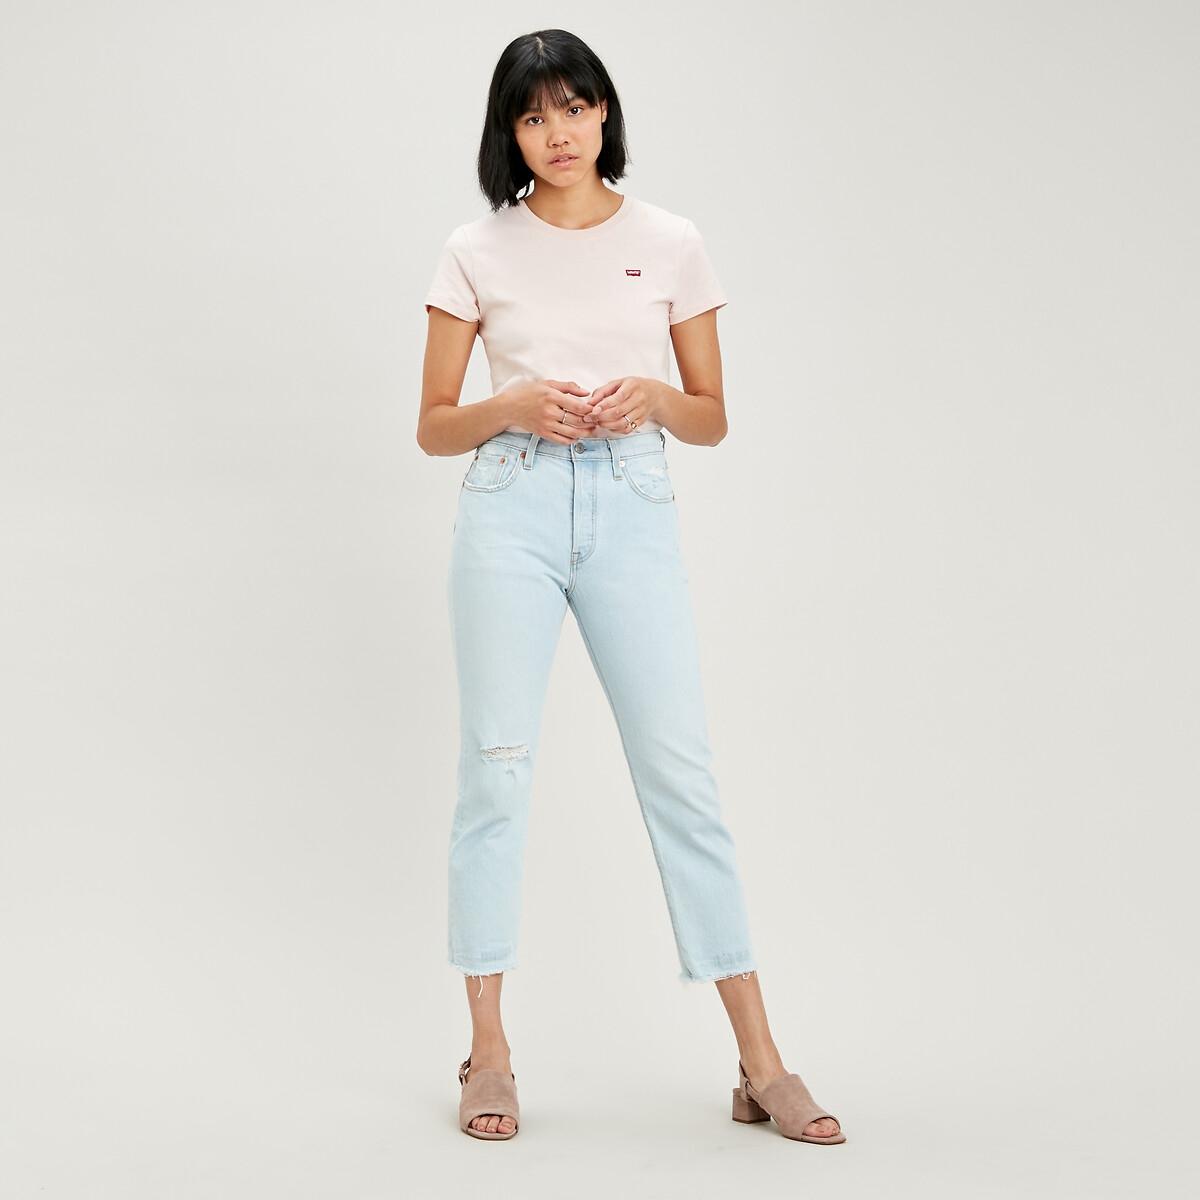 Camiseta PERFECT TEE, cuello redondo y manga corta